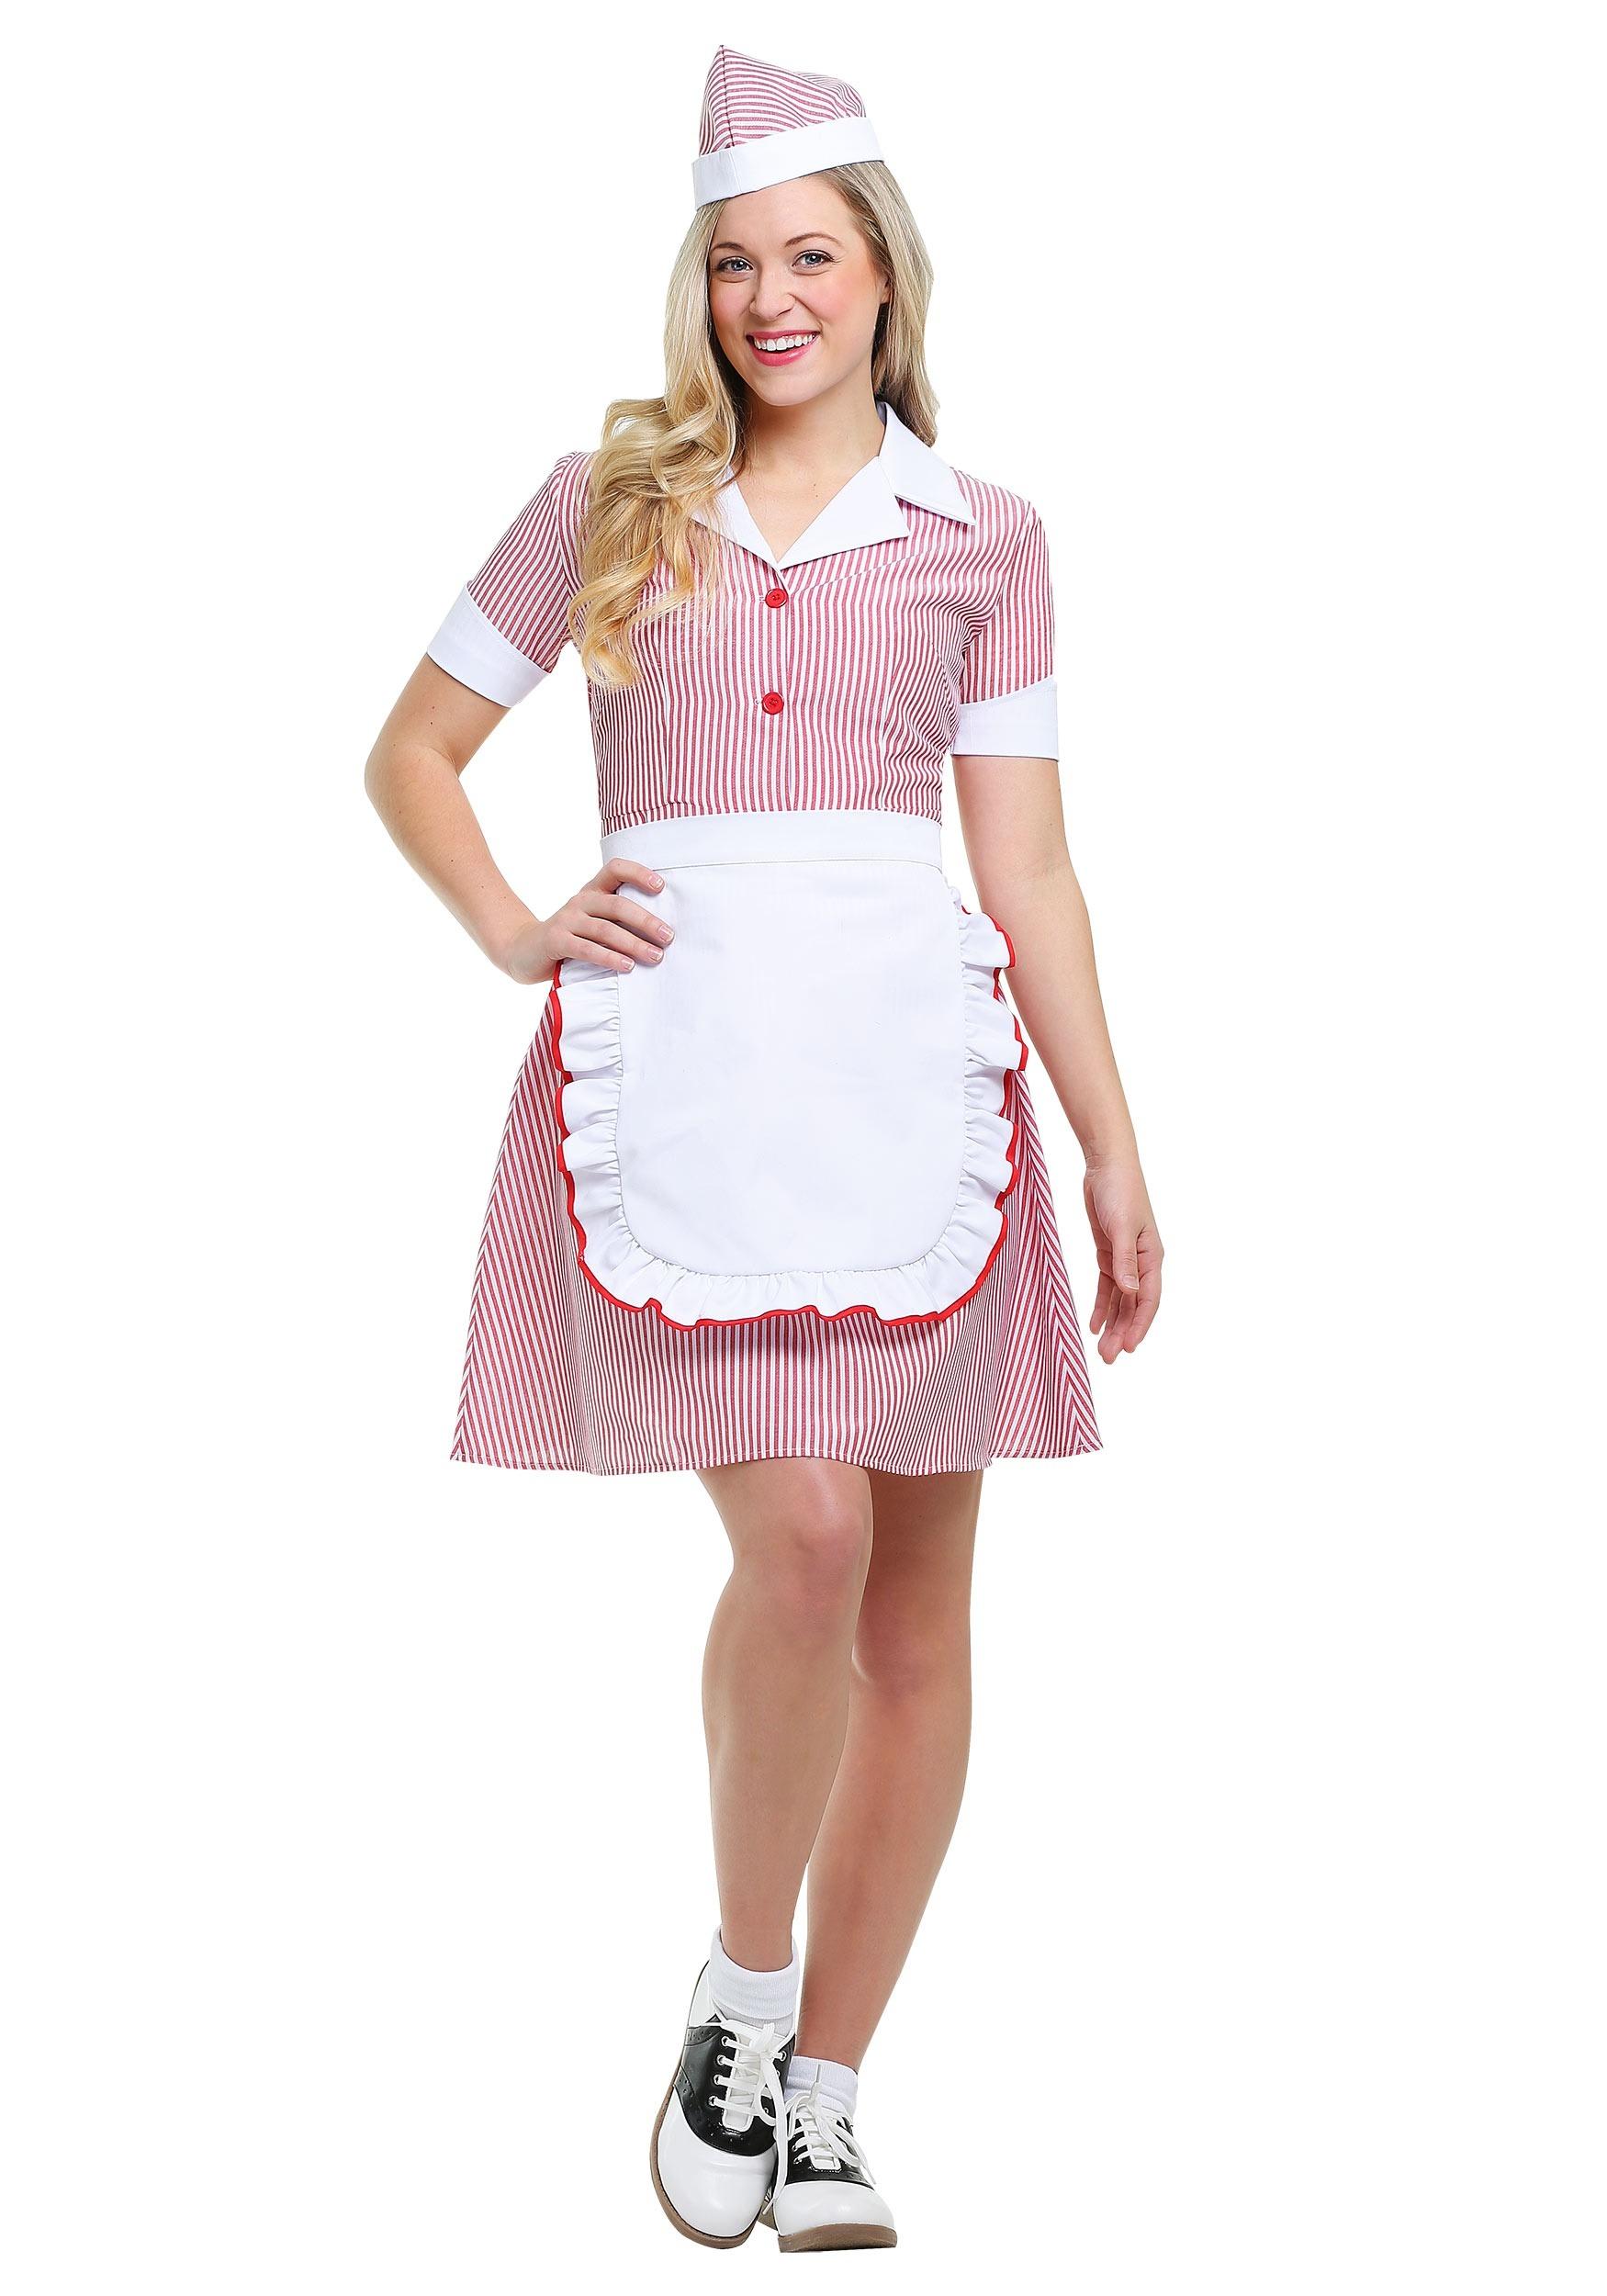 Plus Size Car Hop Costume for Women 1X 2X | 50s Costume